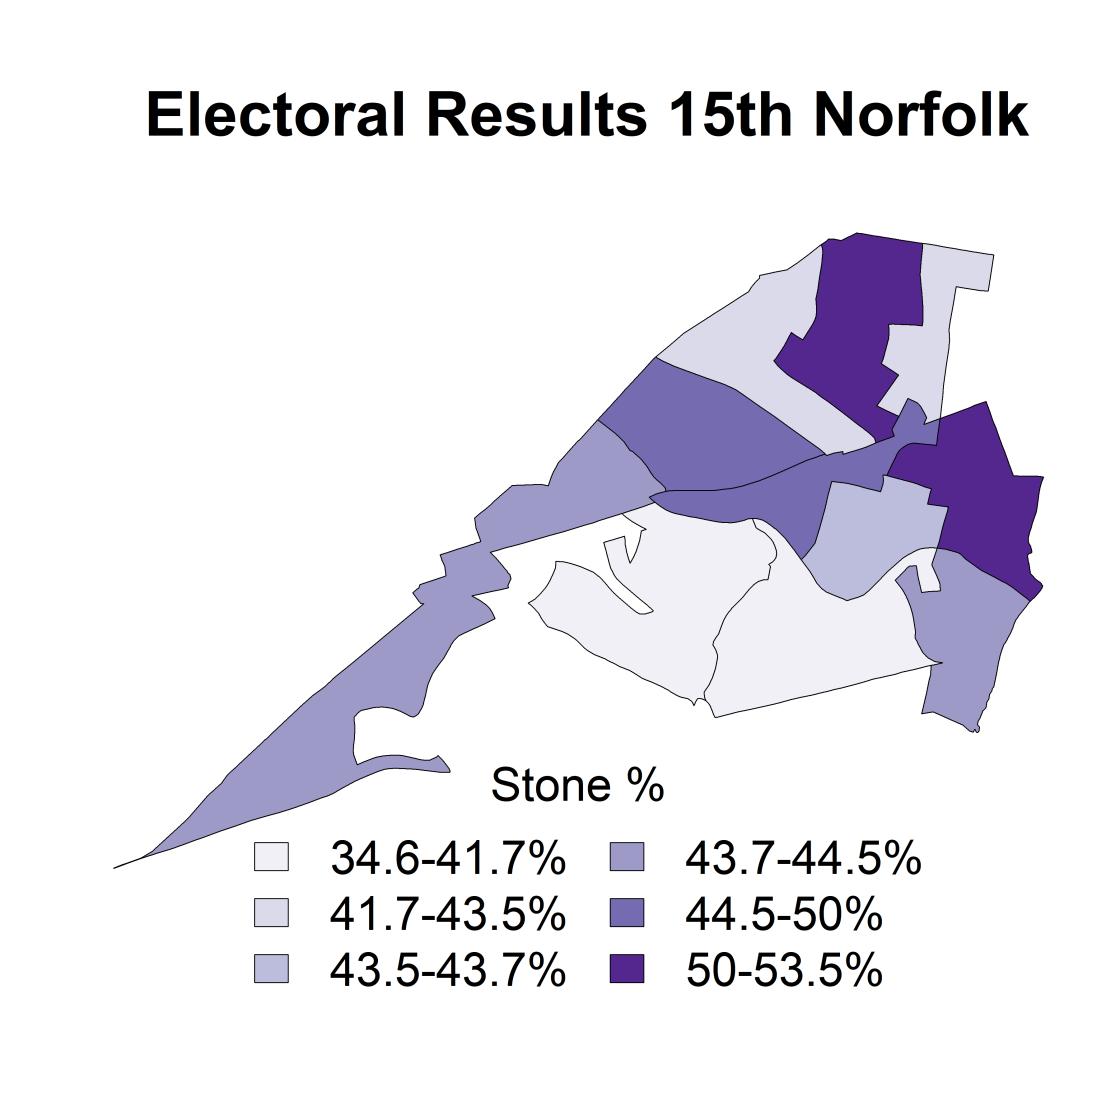 norfolk15_prec_stone